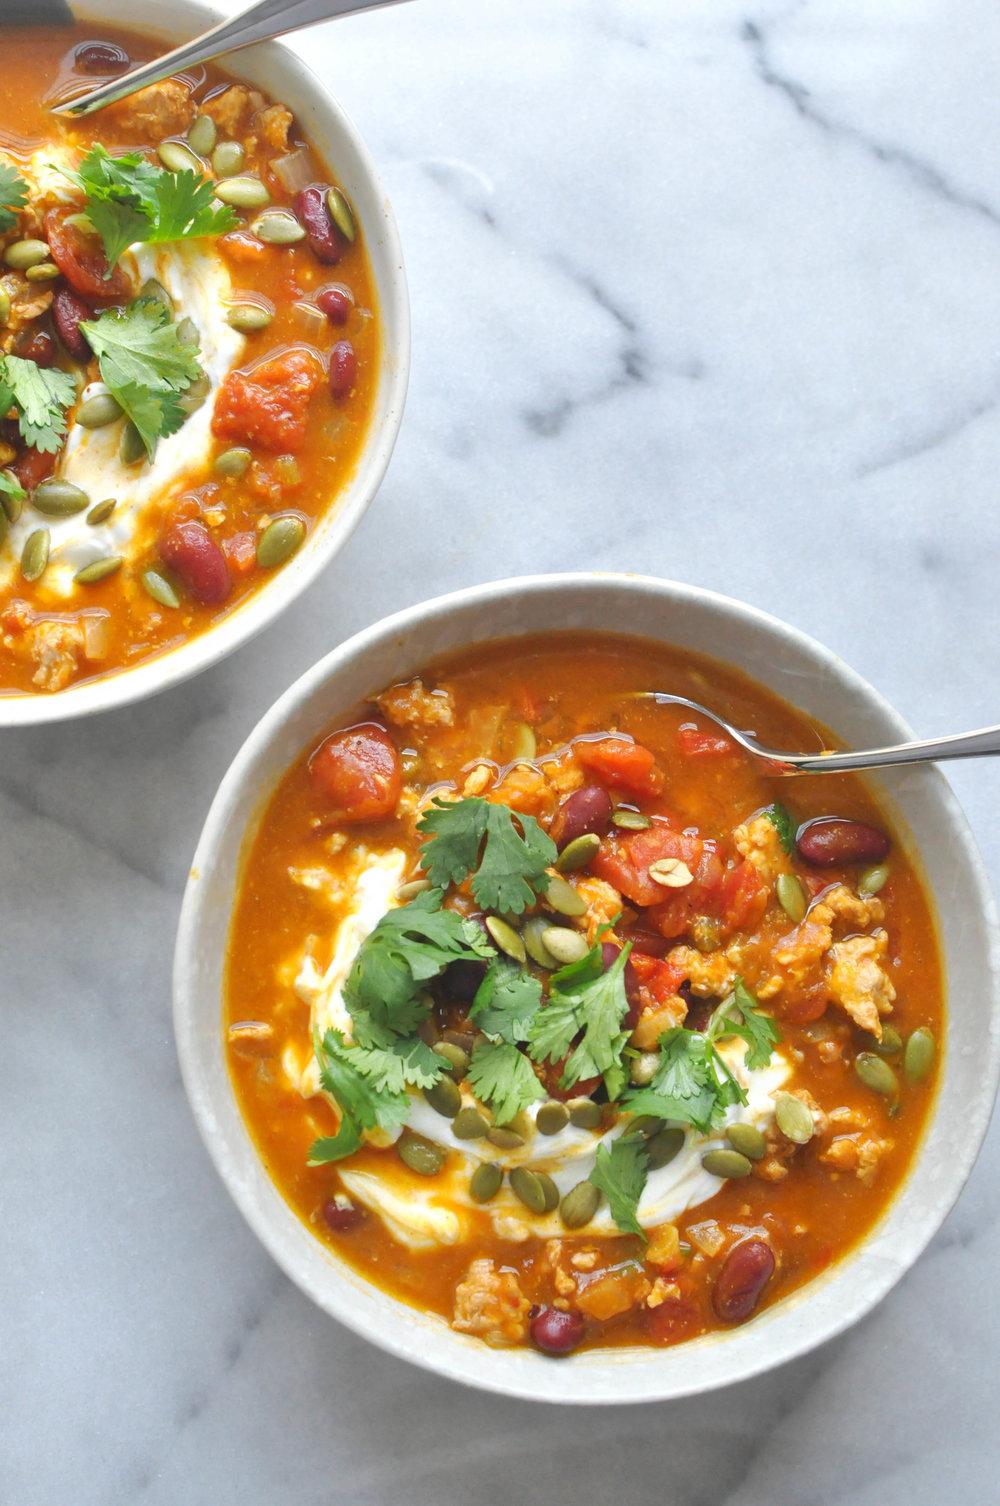 Slow Cooker Turkey Pumpkin Chili Recipe is a delicious dinner | Shiny Happy Bright